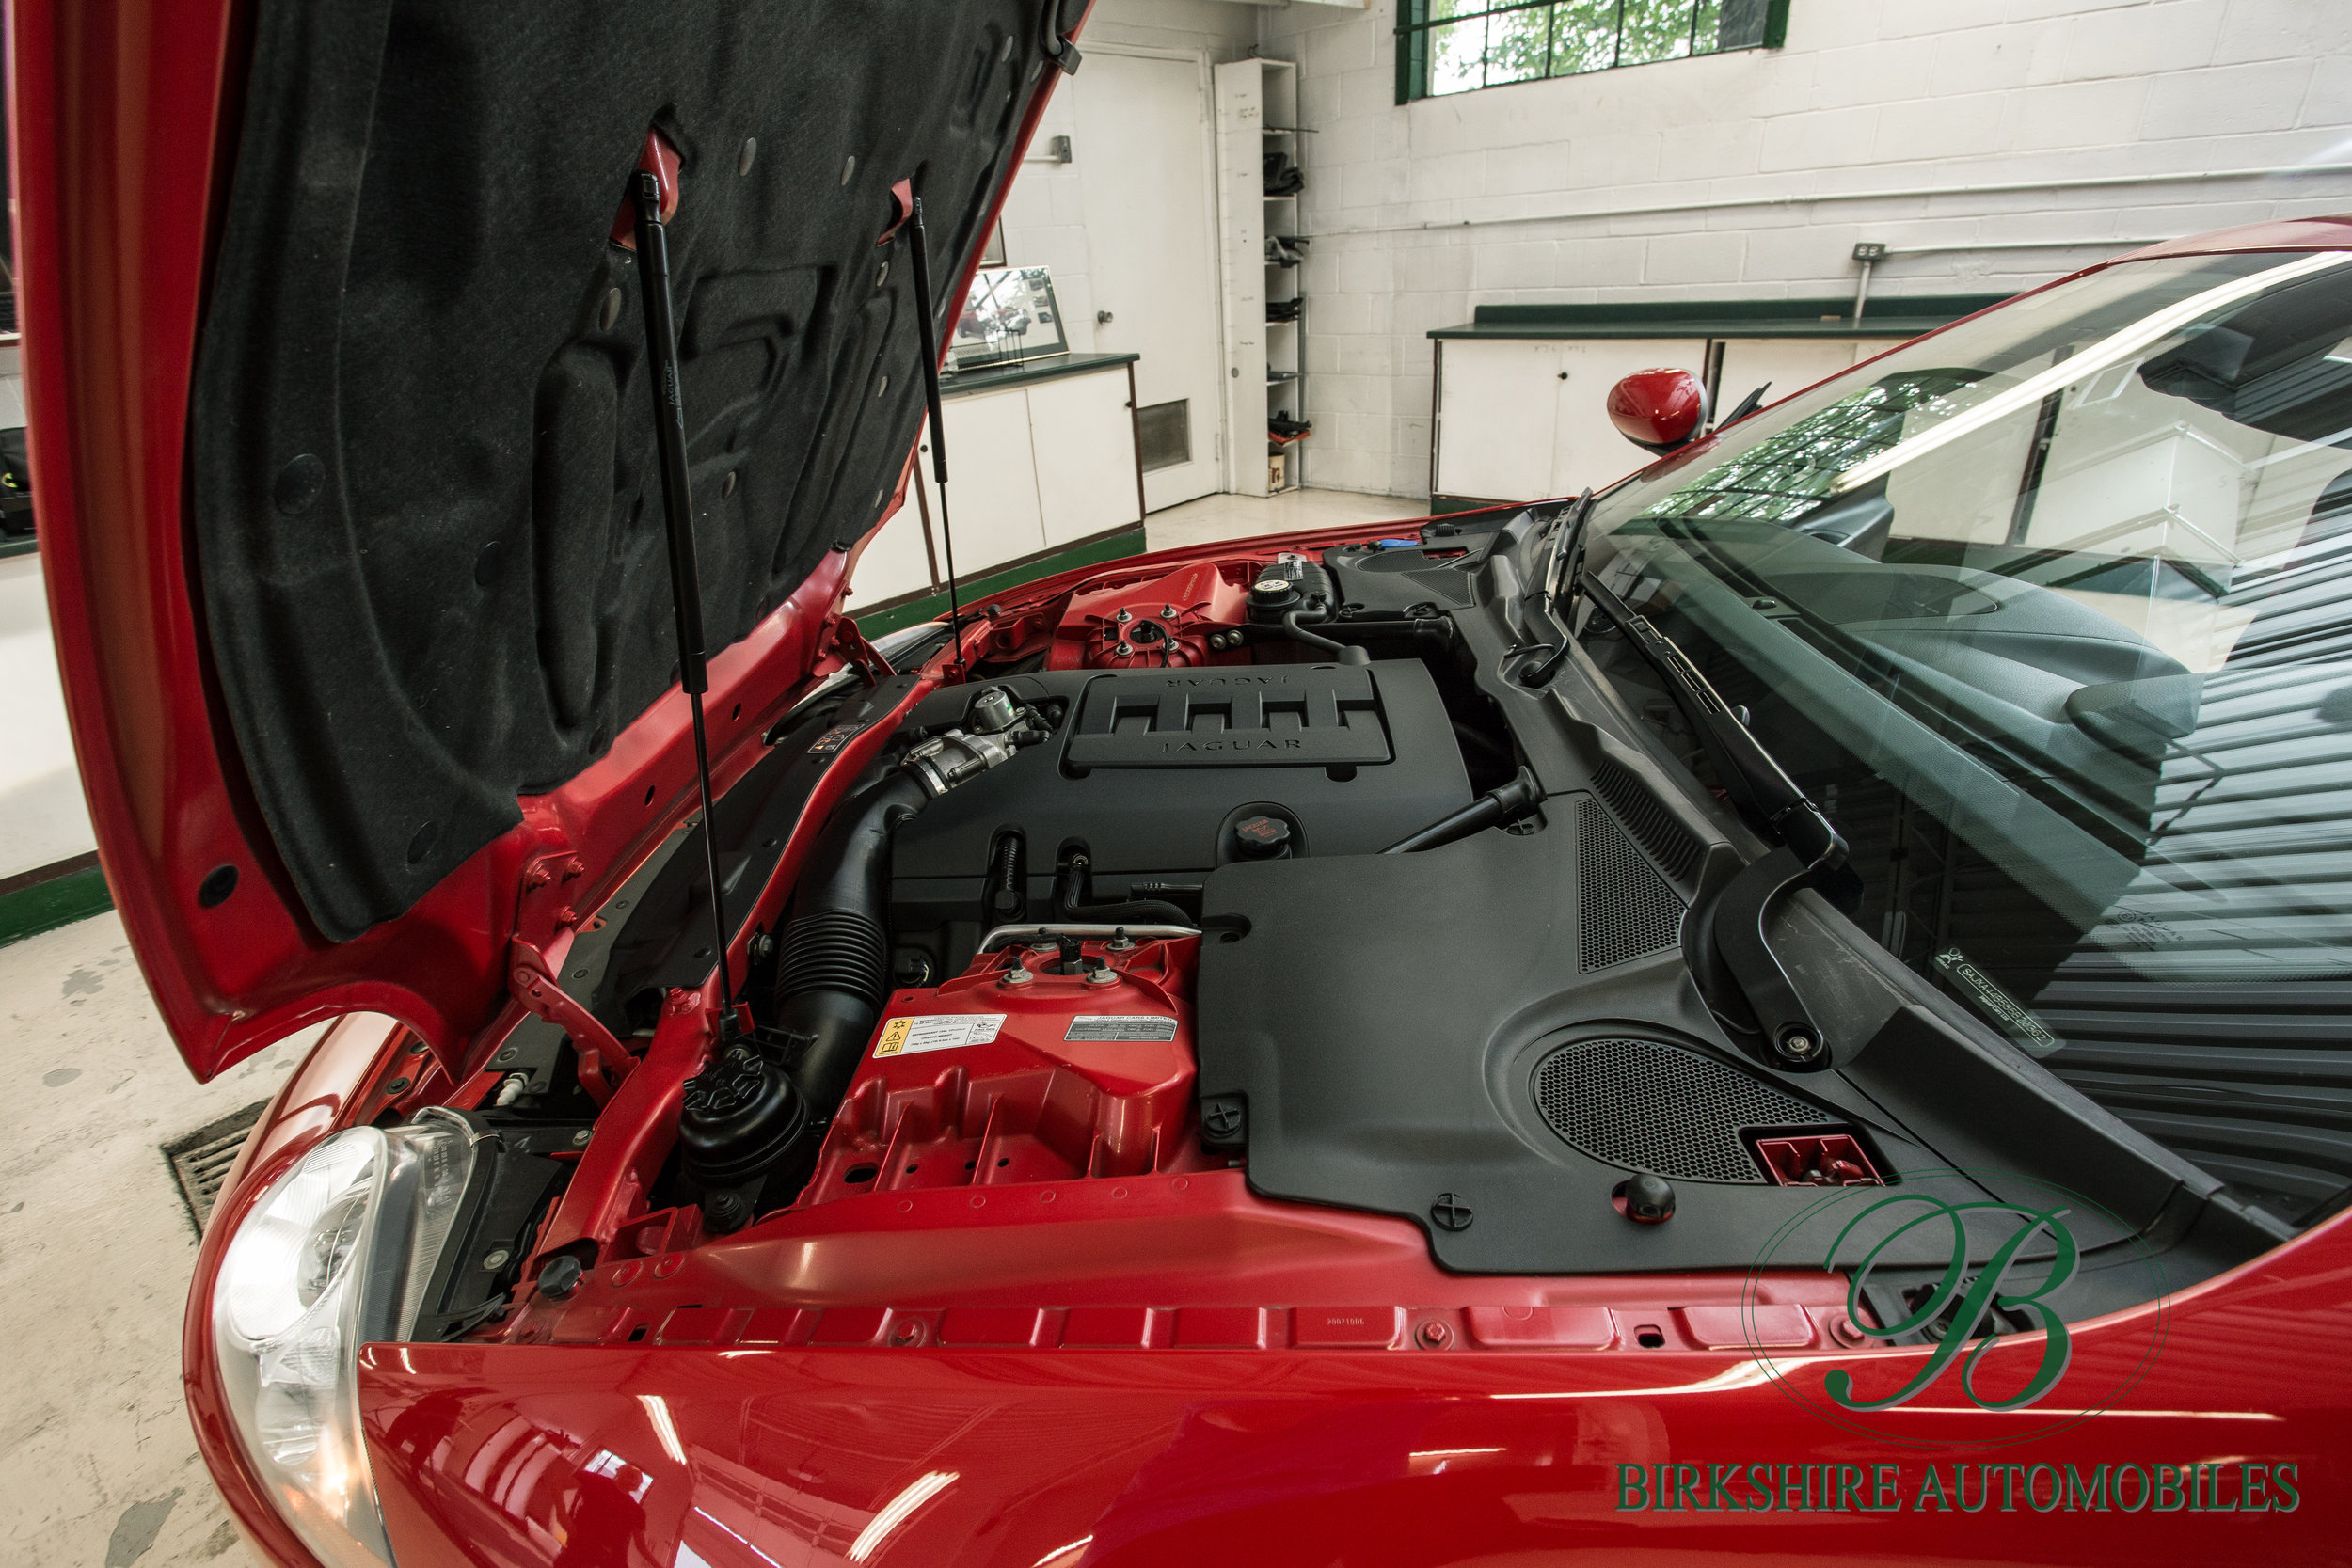 Birkshire Automobiles-97.jpg